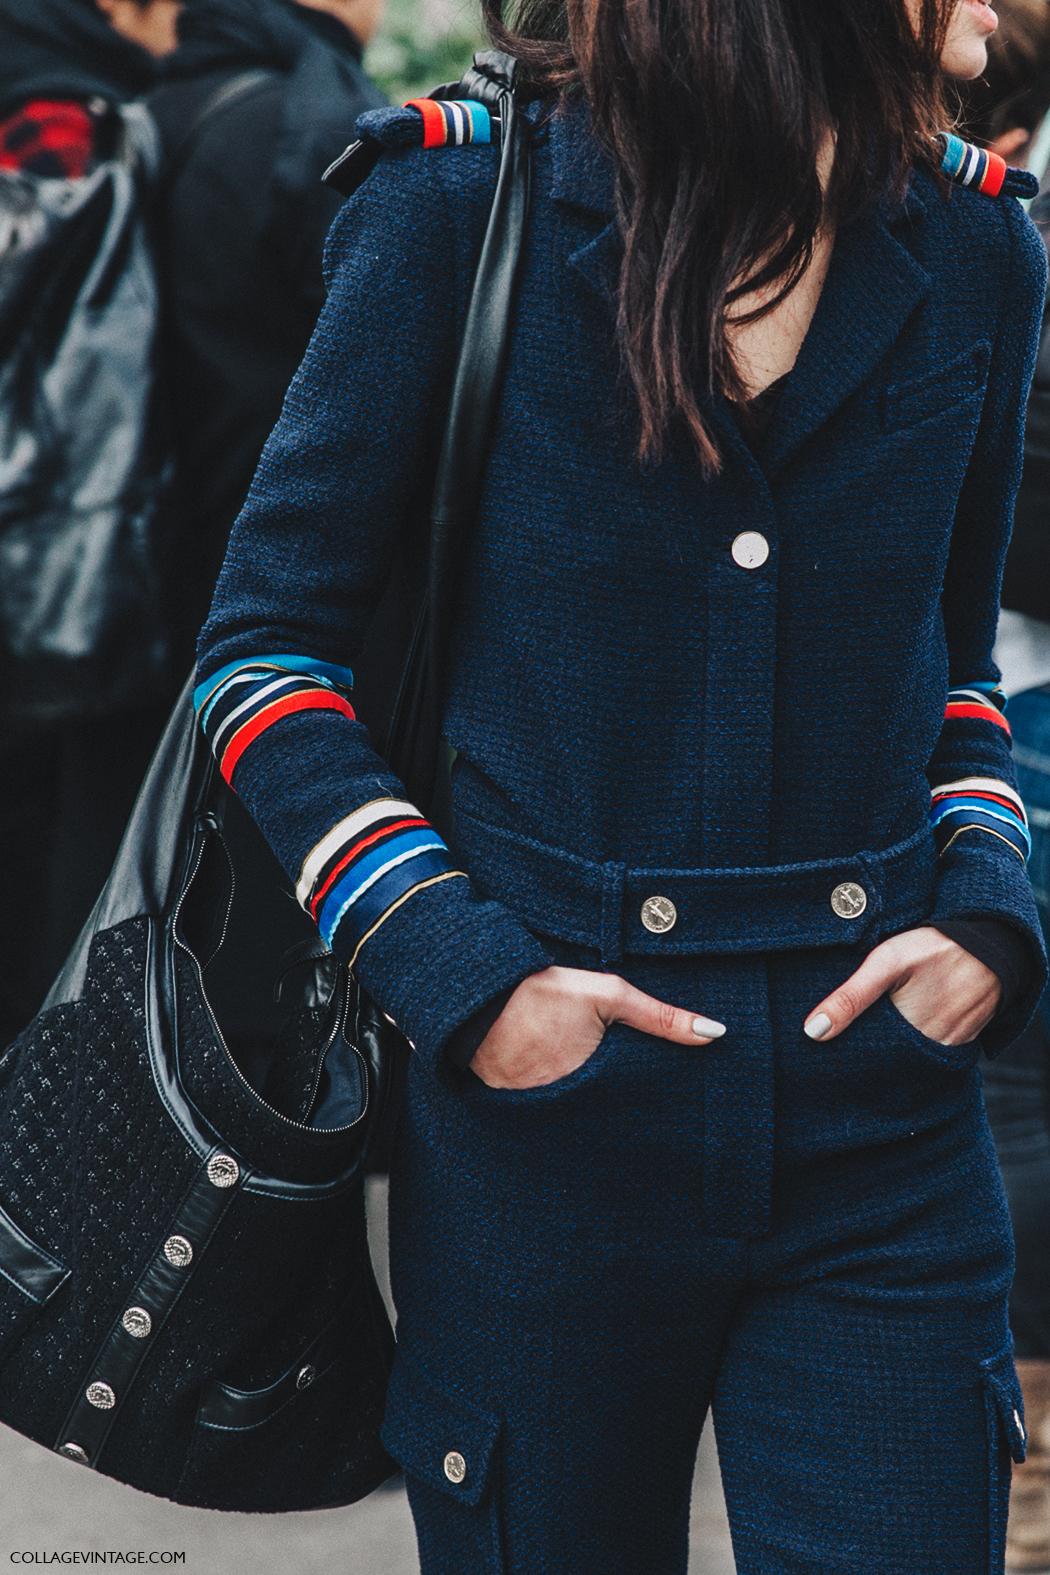 PFW-Paris_Fashion_Week_Fall_2016-Street_Style-Collage_Vintage-Chanel-7